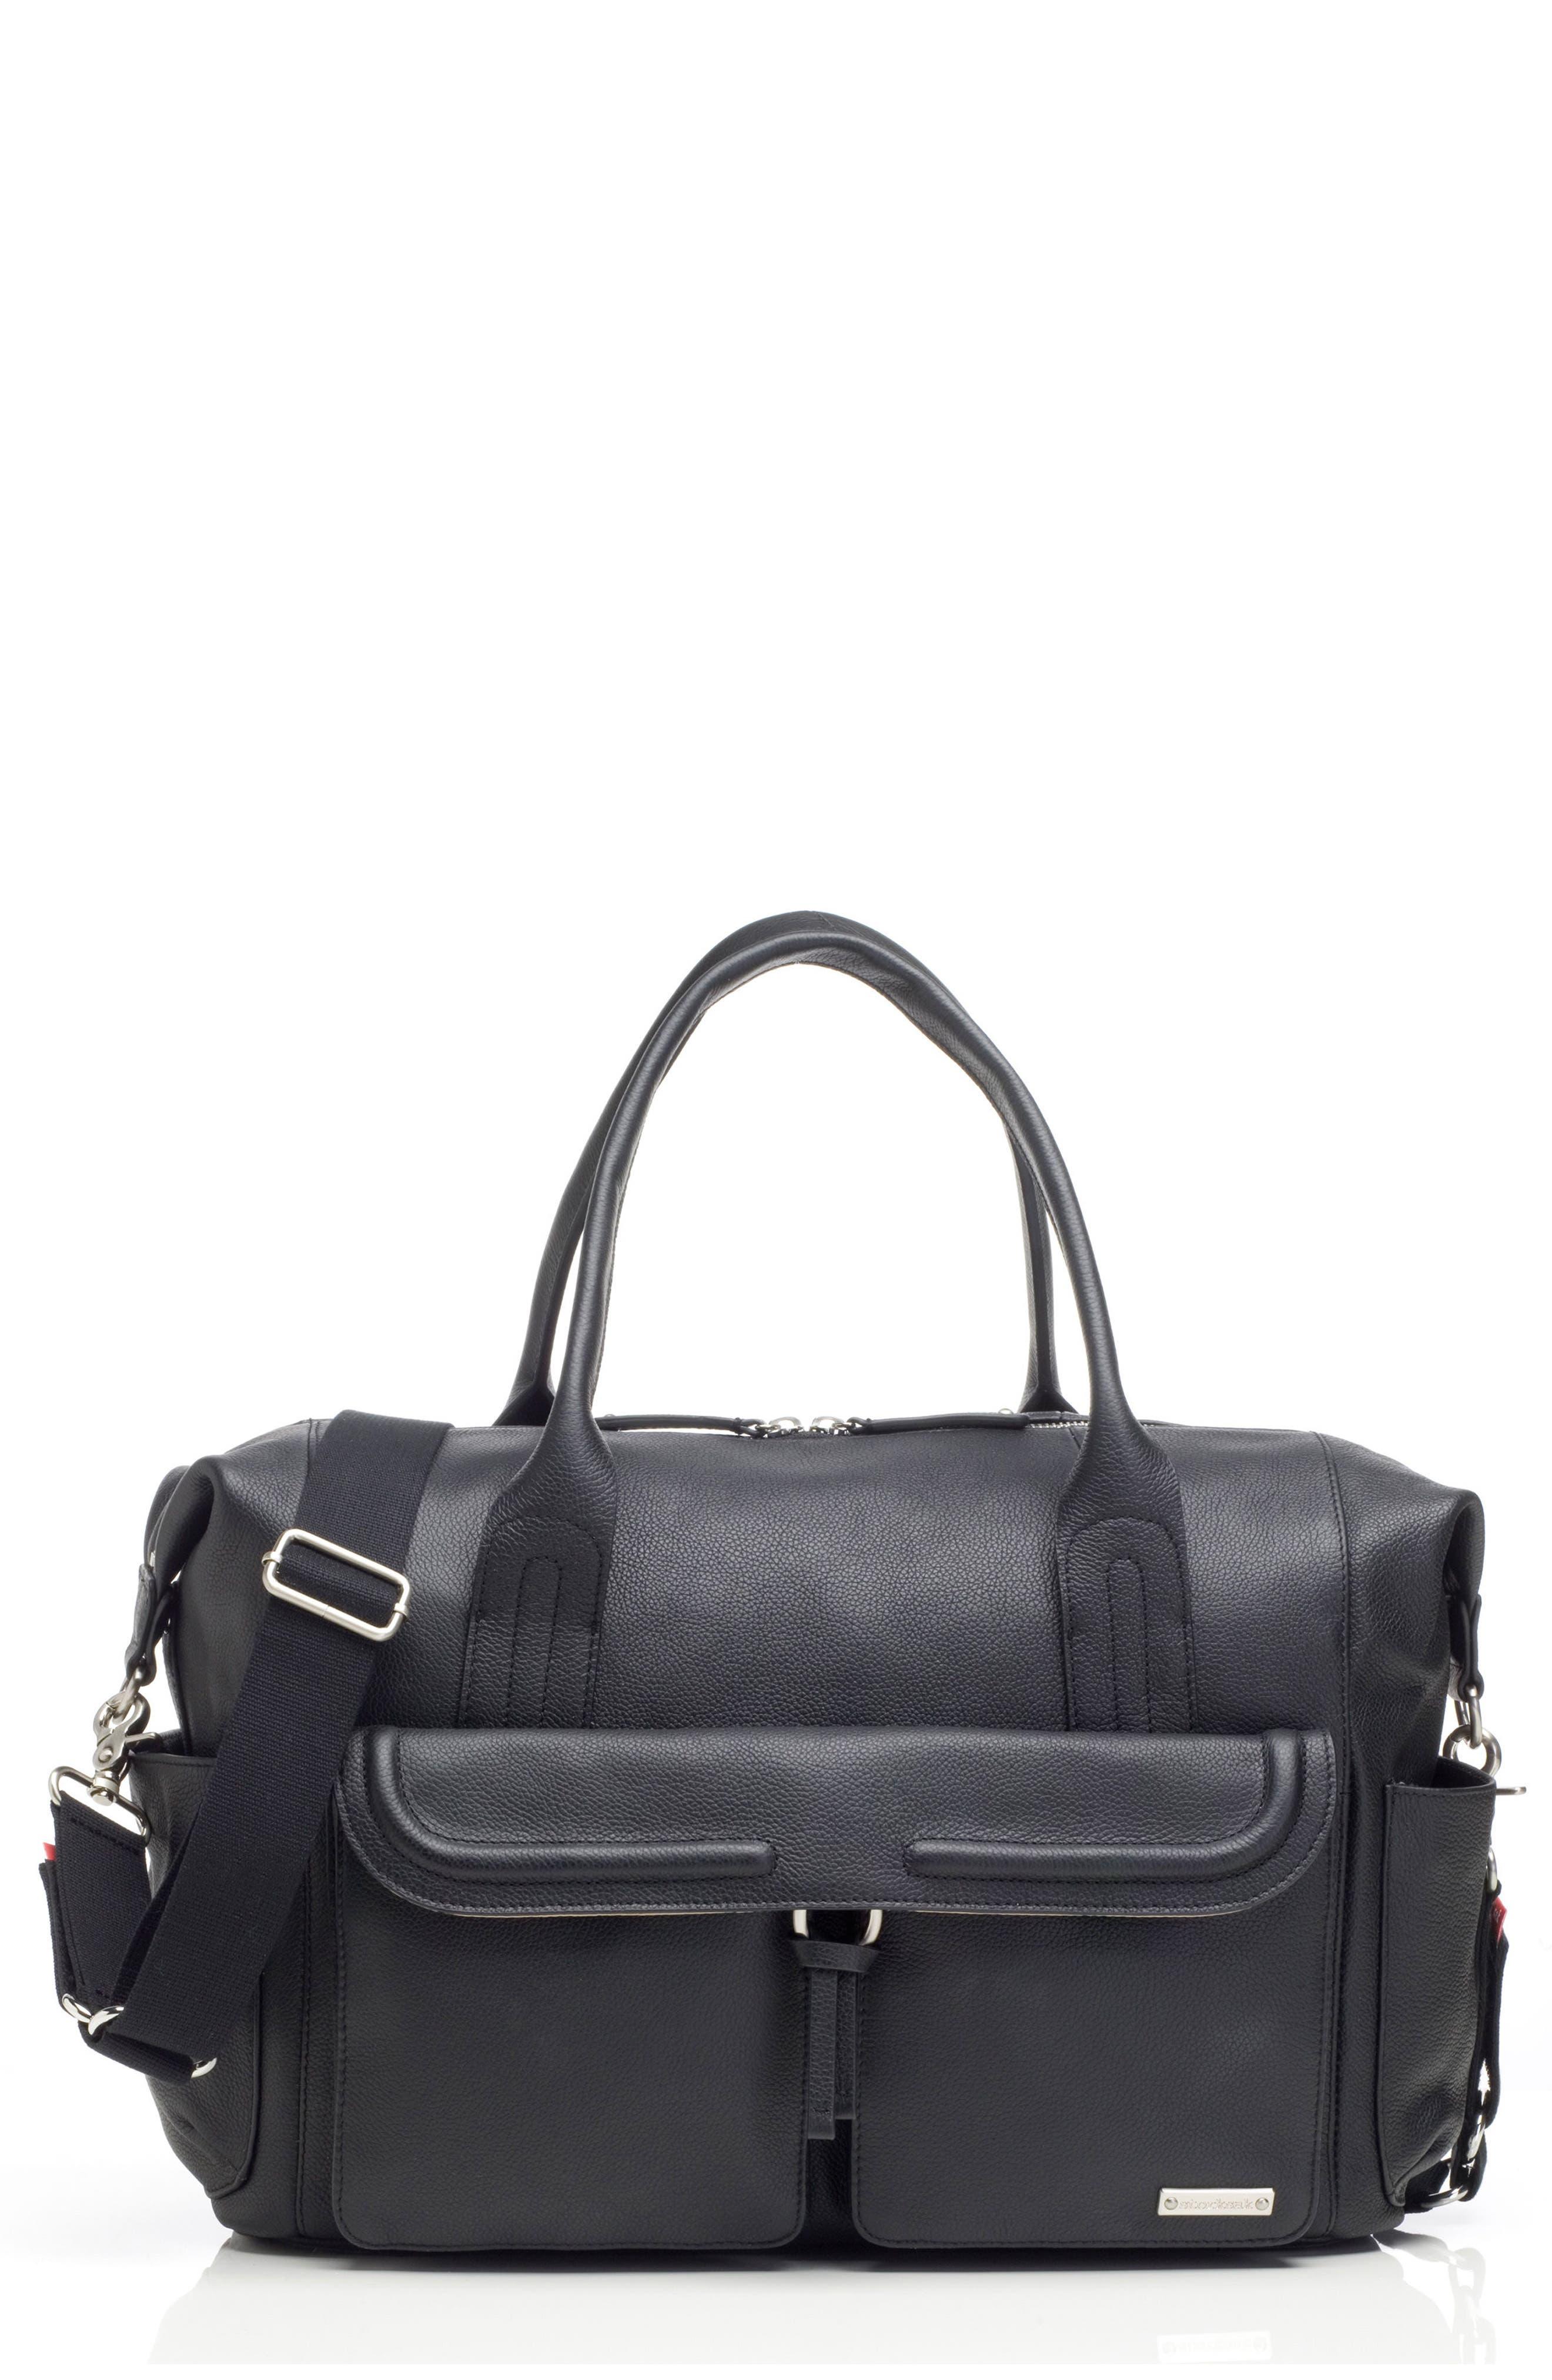 Storsak Leather Diaper Bag,                         Main,                         color, BLACK